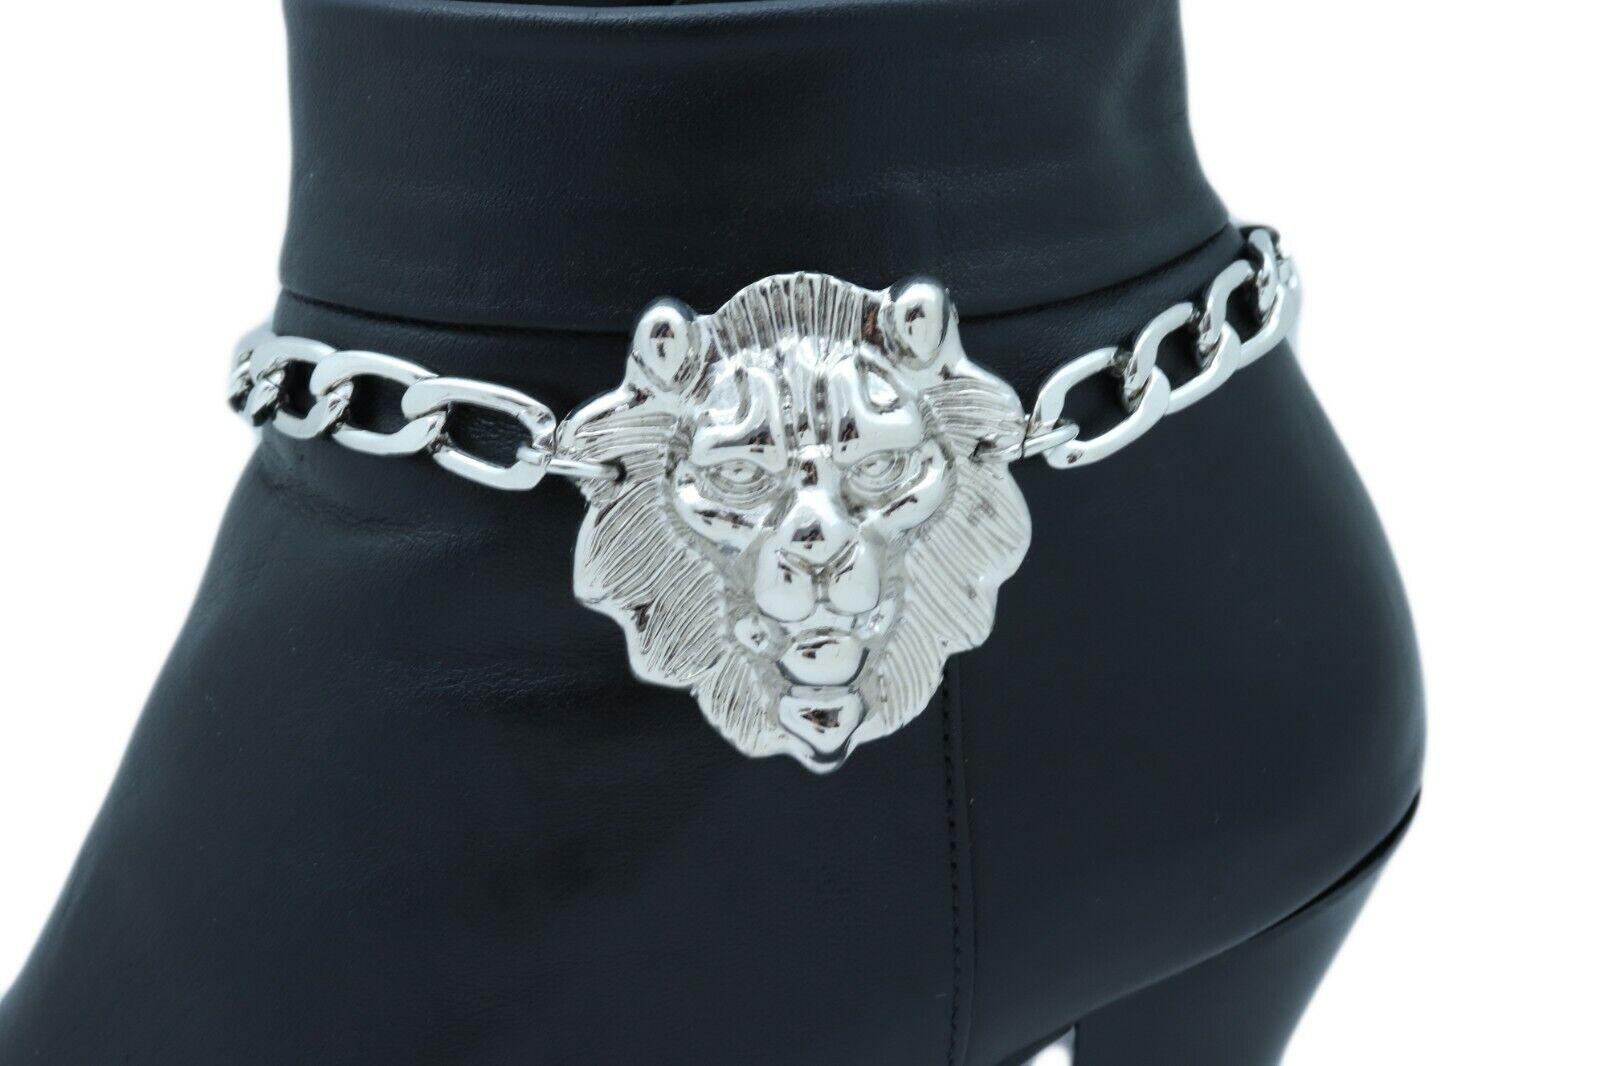 Travel Women Silver Metal Boot Chain Bracelet Anklet Shoe Shiny Lion Charm Bling